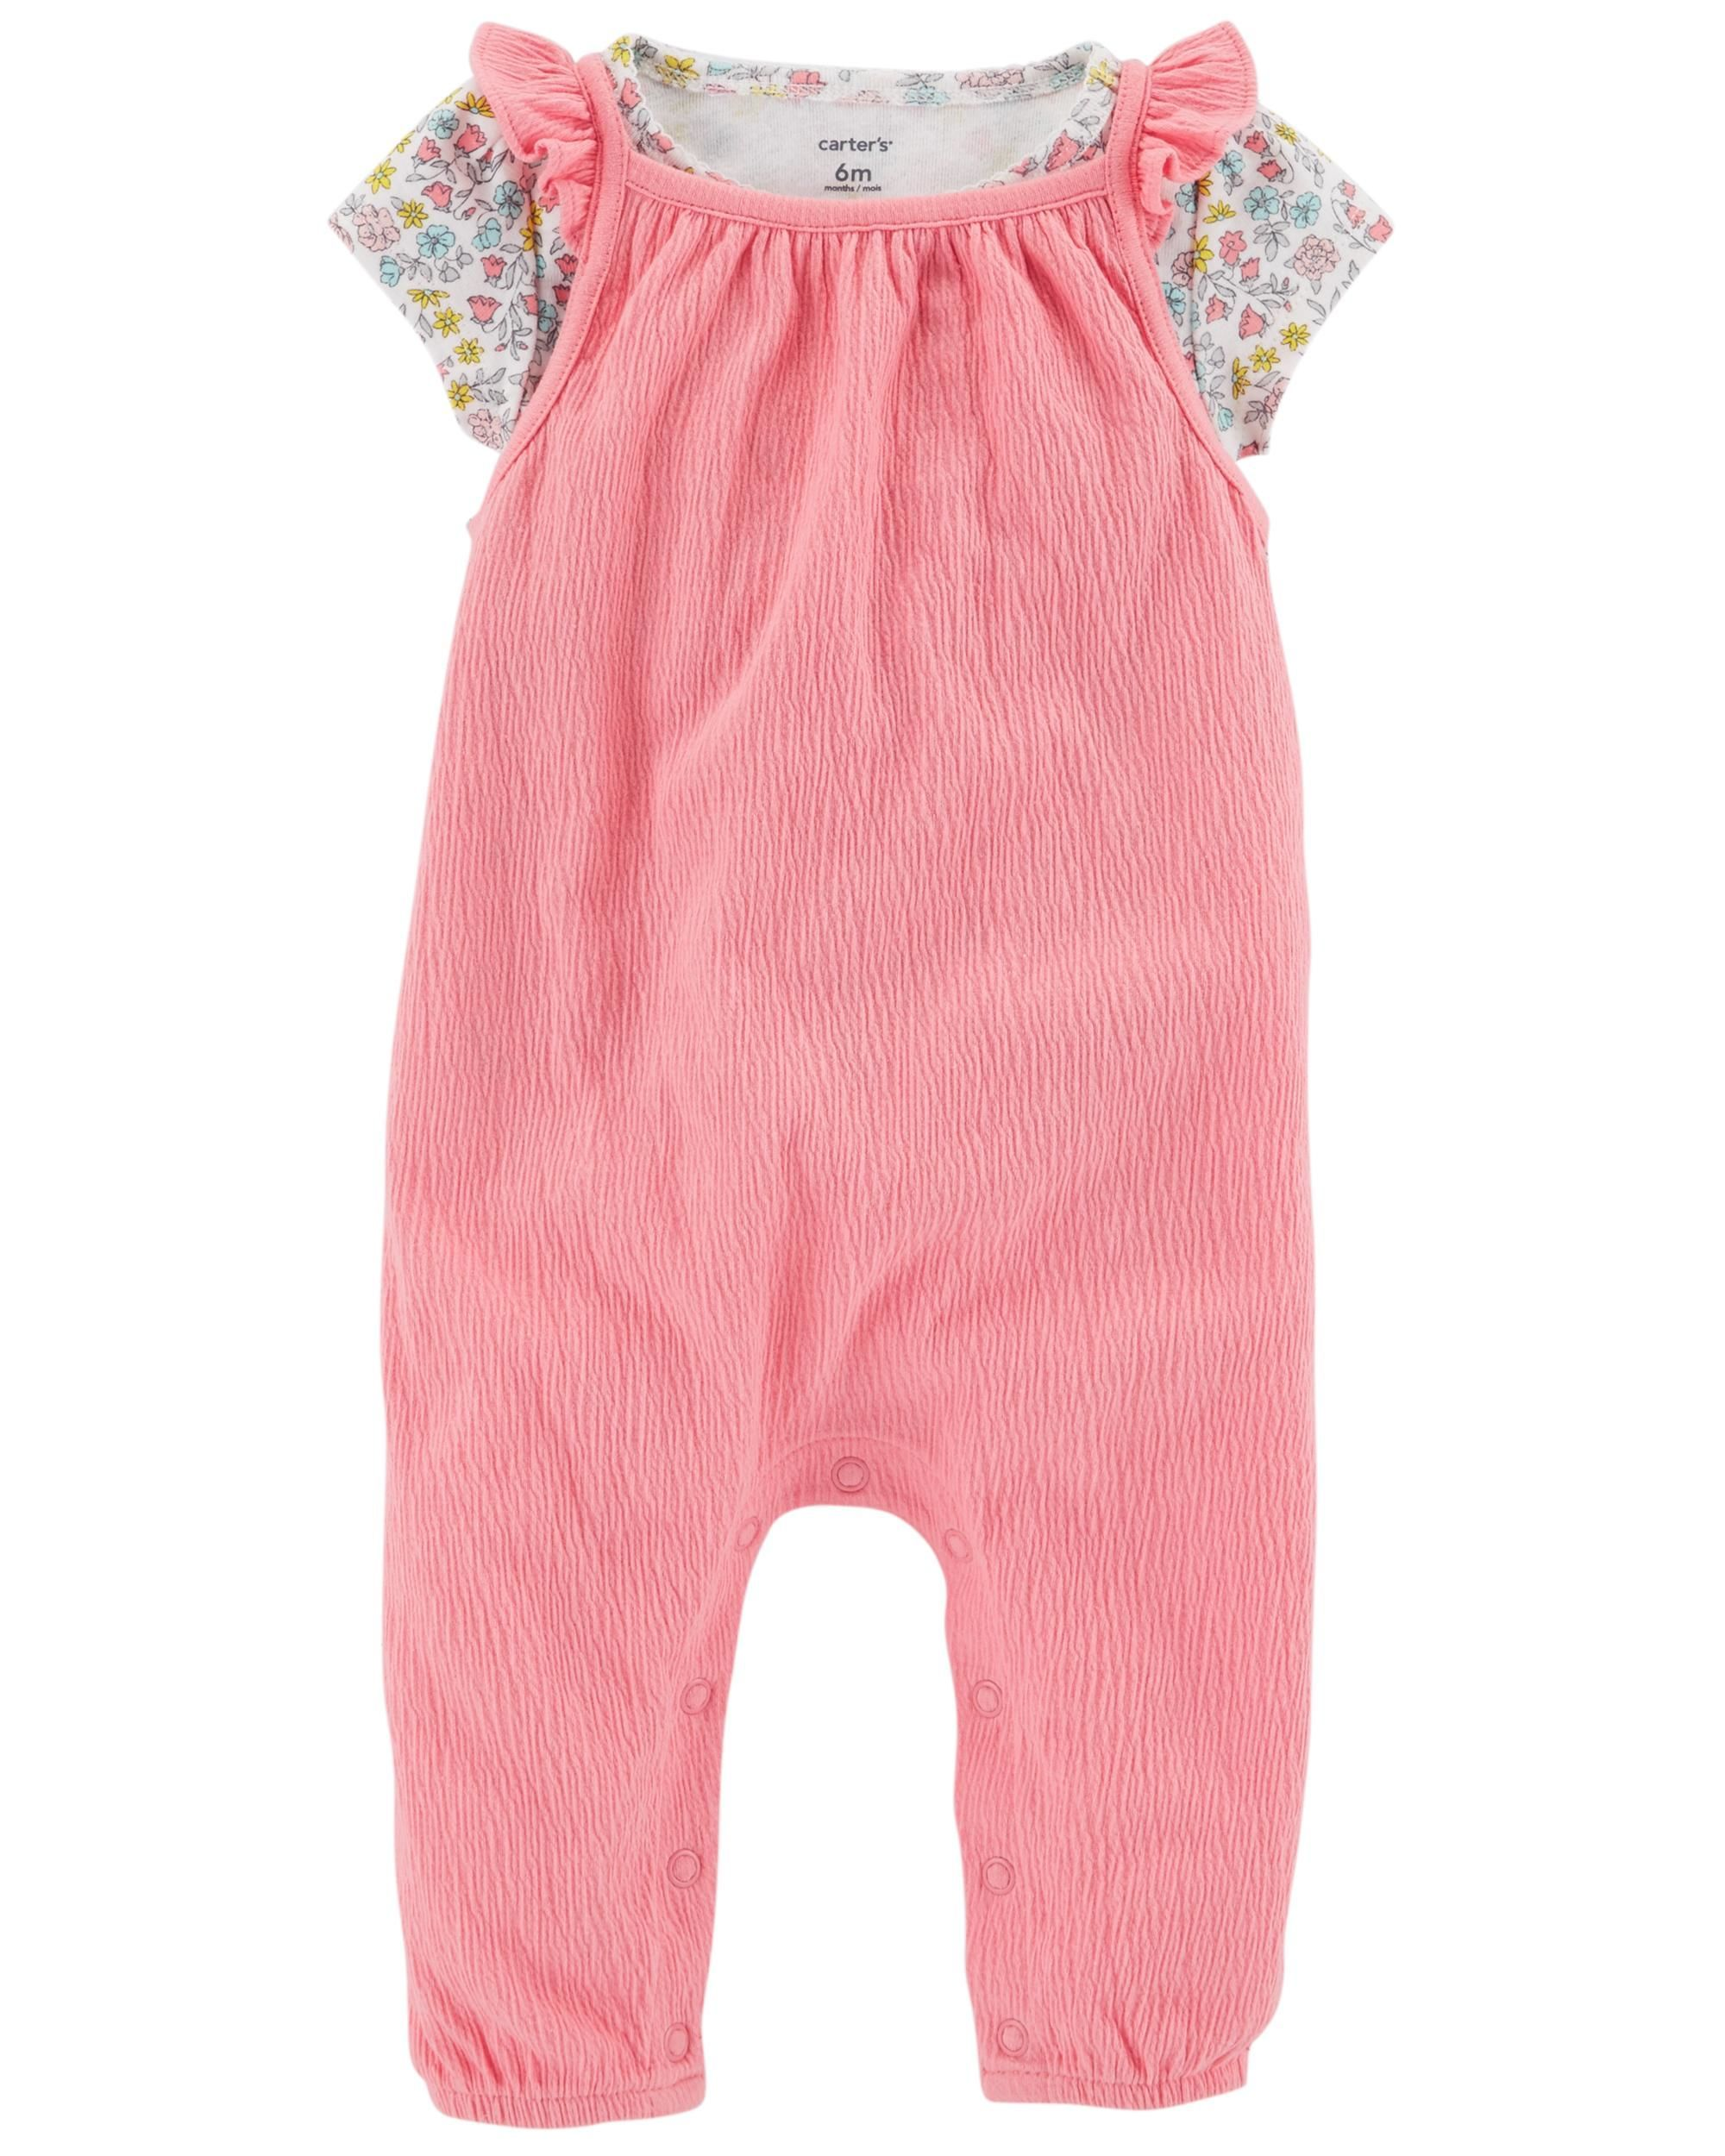 Dfenere Black Theme Personality Theme Graphic Newborn Baby Short Sleeve Bodysuit Romper Infant Summer Clothing